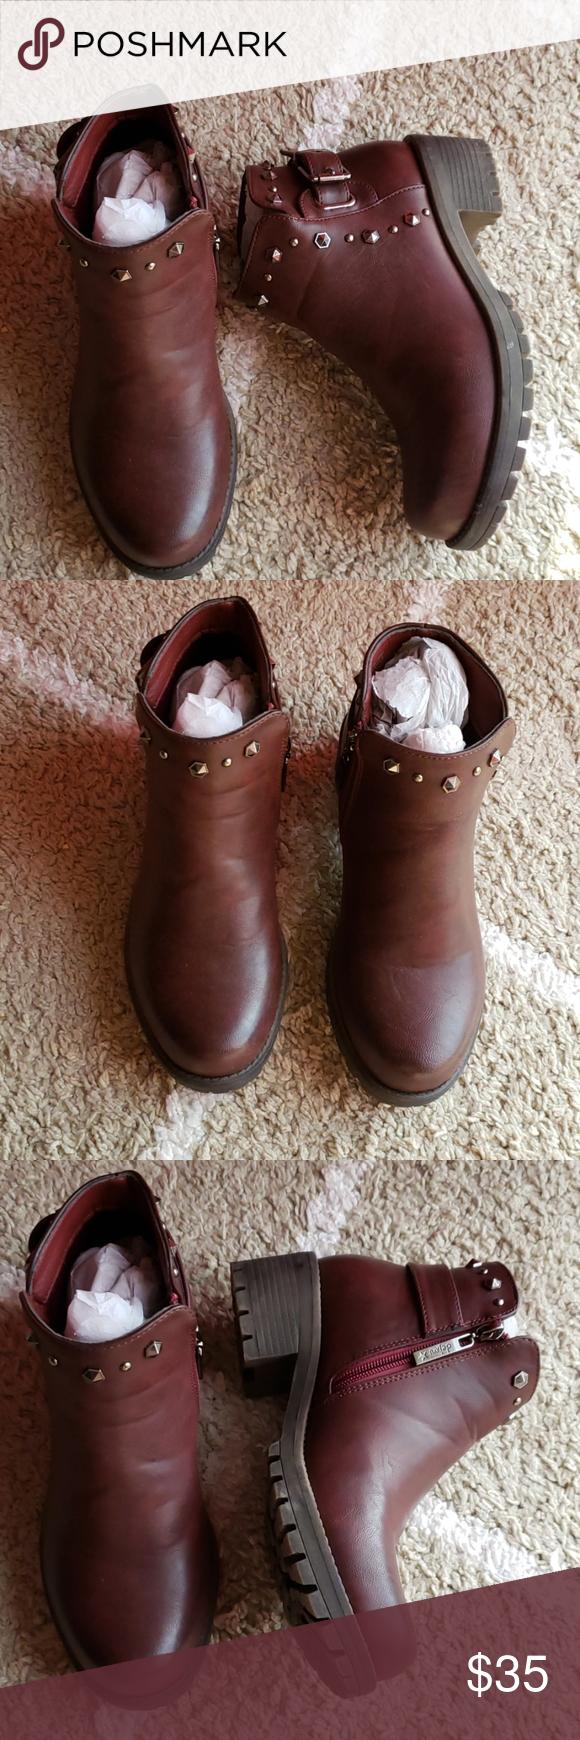 New dark burgundy ankle bootie Brand new Bootie never worn size 36 dejavu Shoes Ankle Boots & Booties #myposhpicks